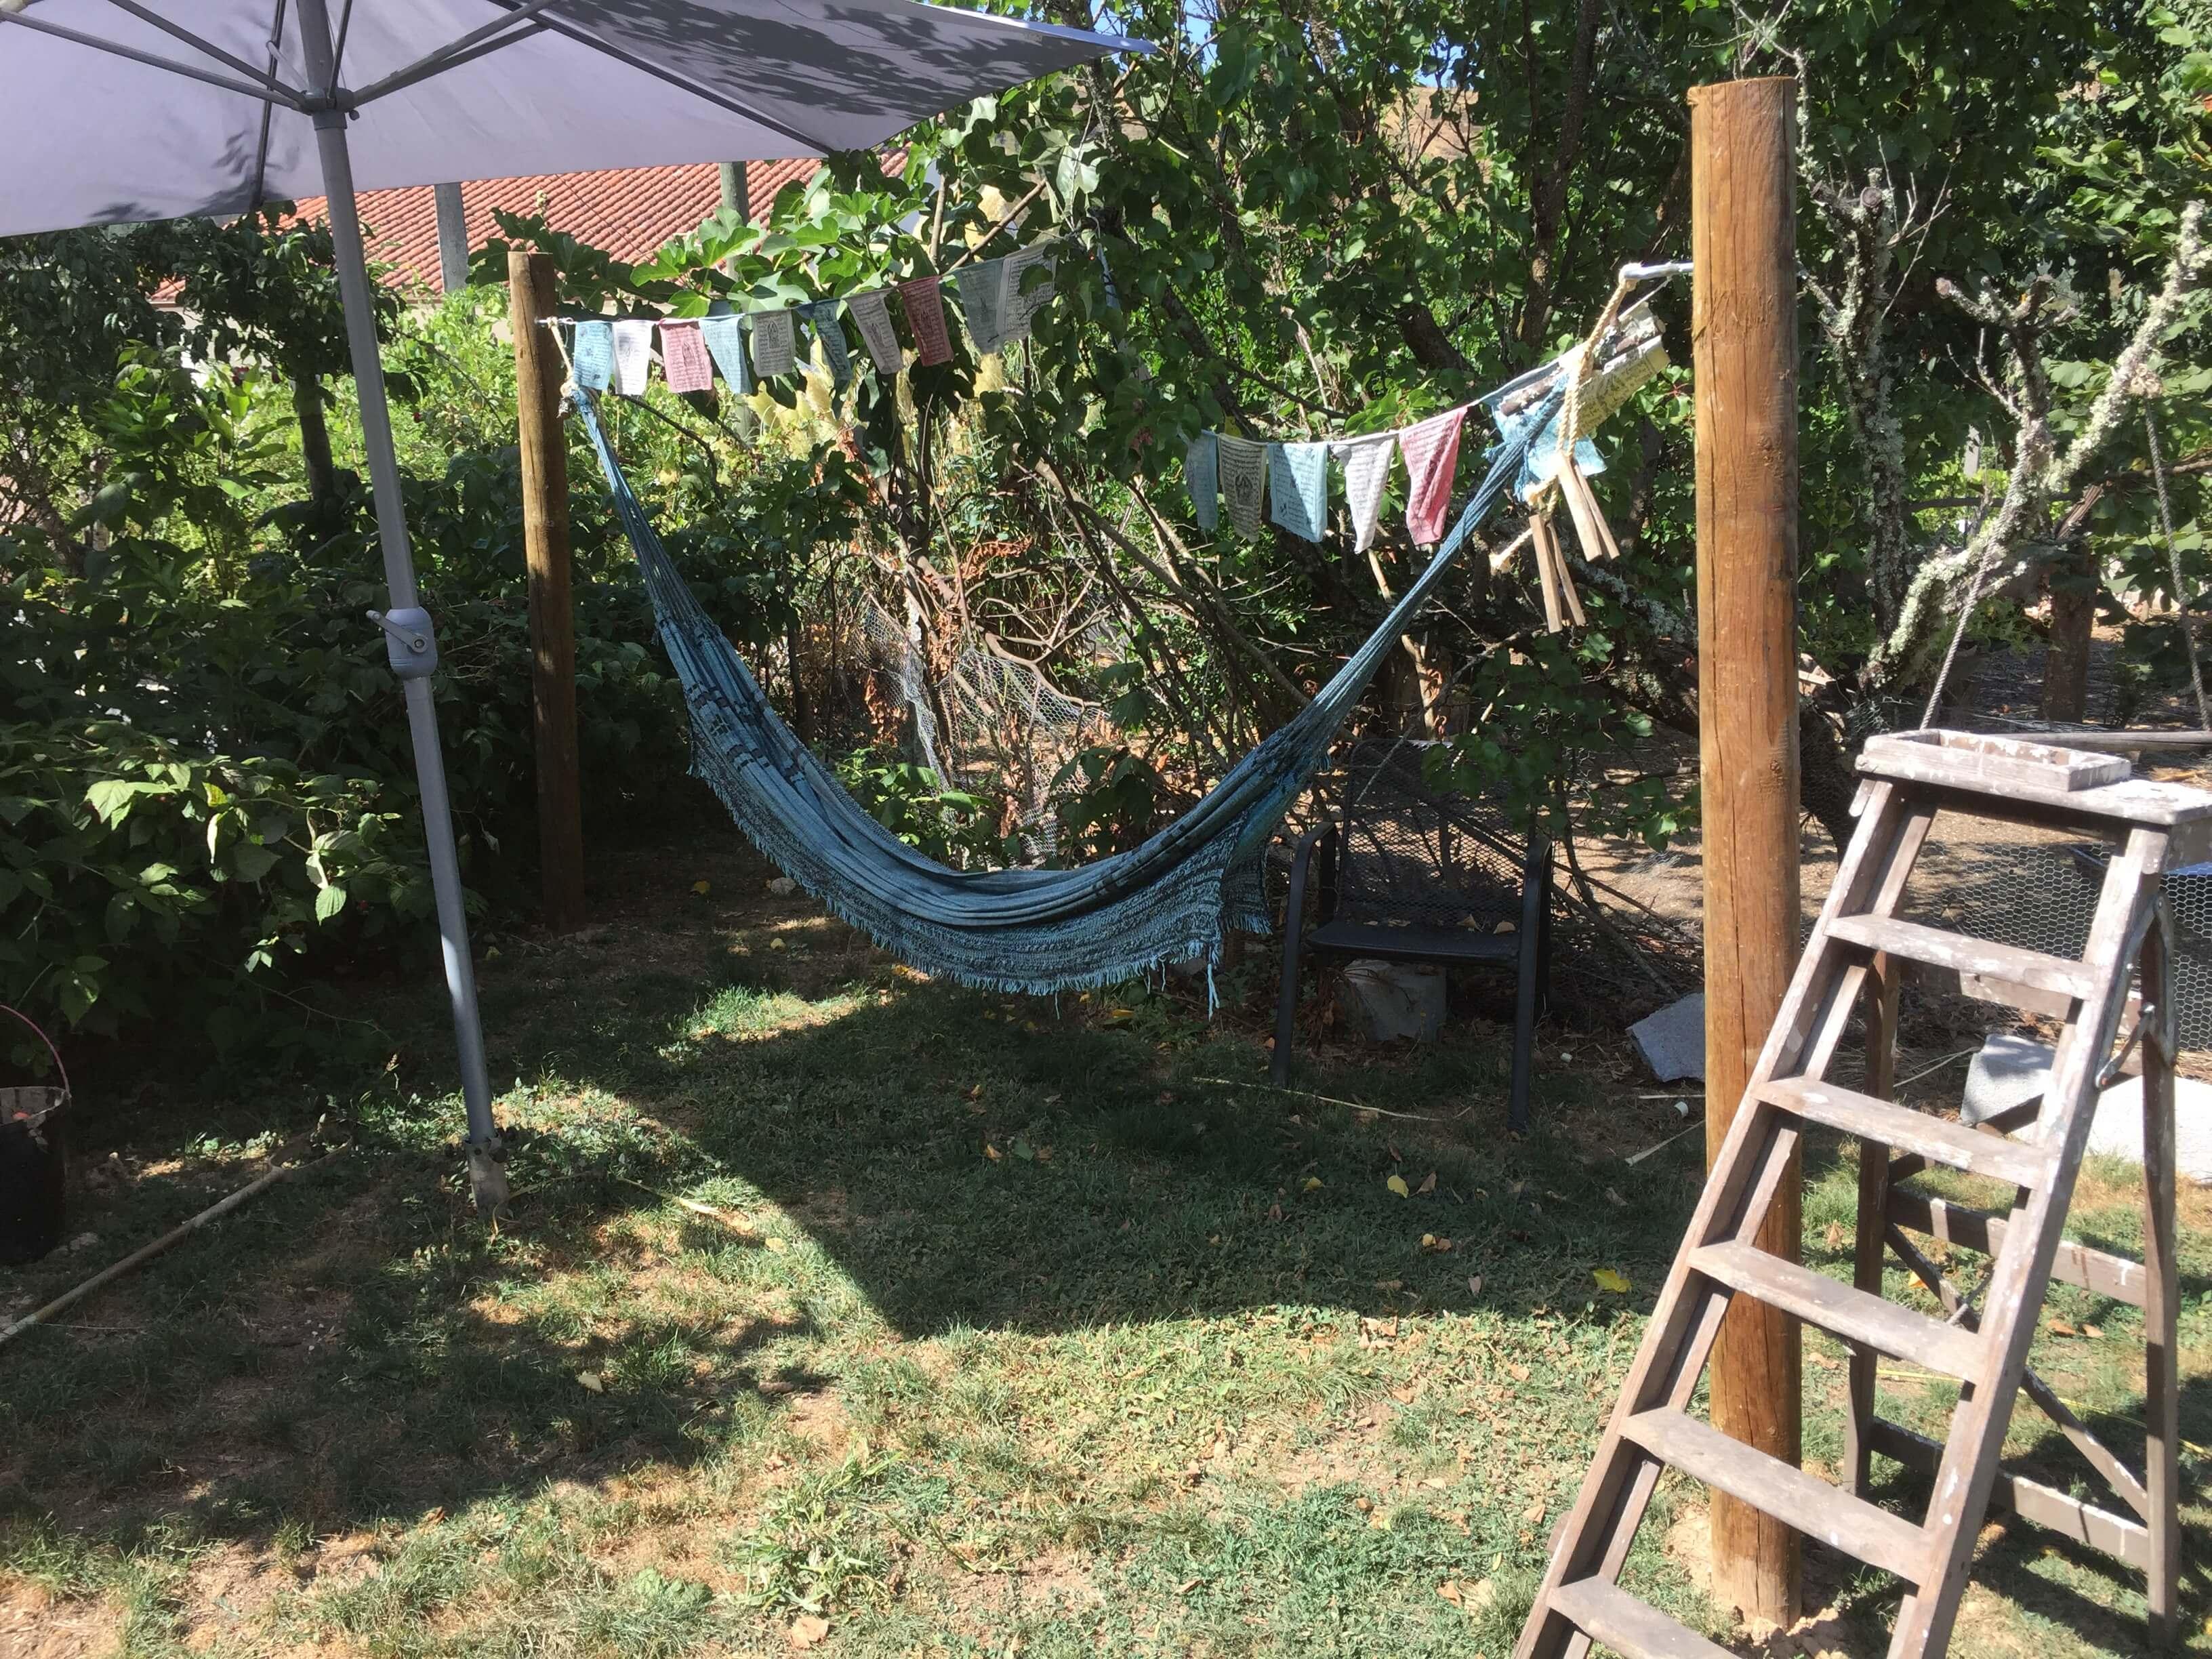 Casa Traca hottub rust ruimte en relaxen